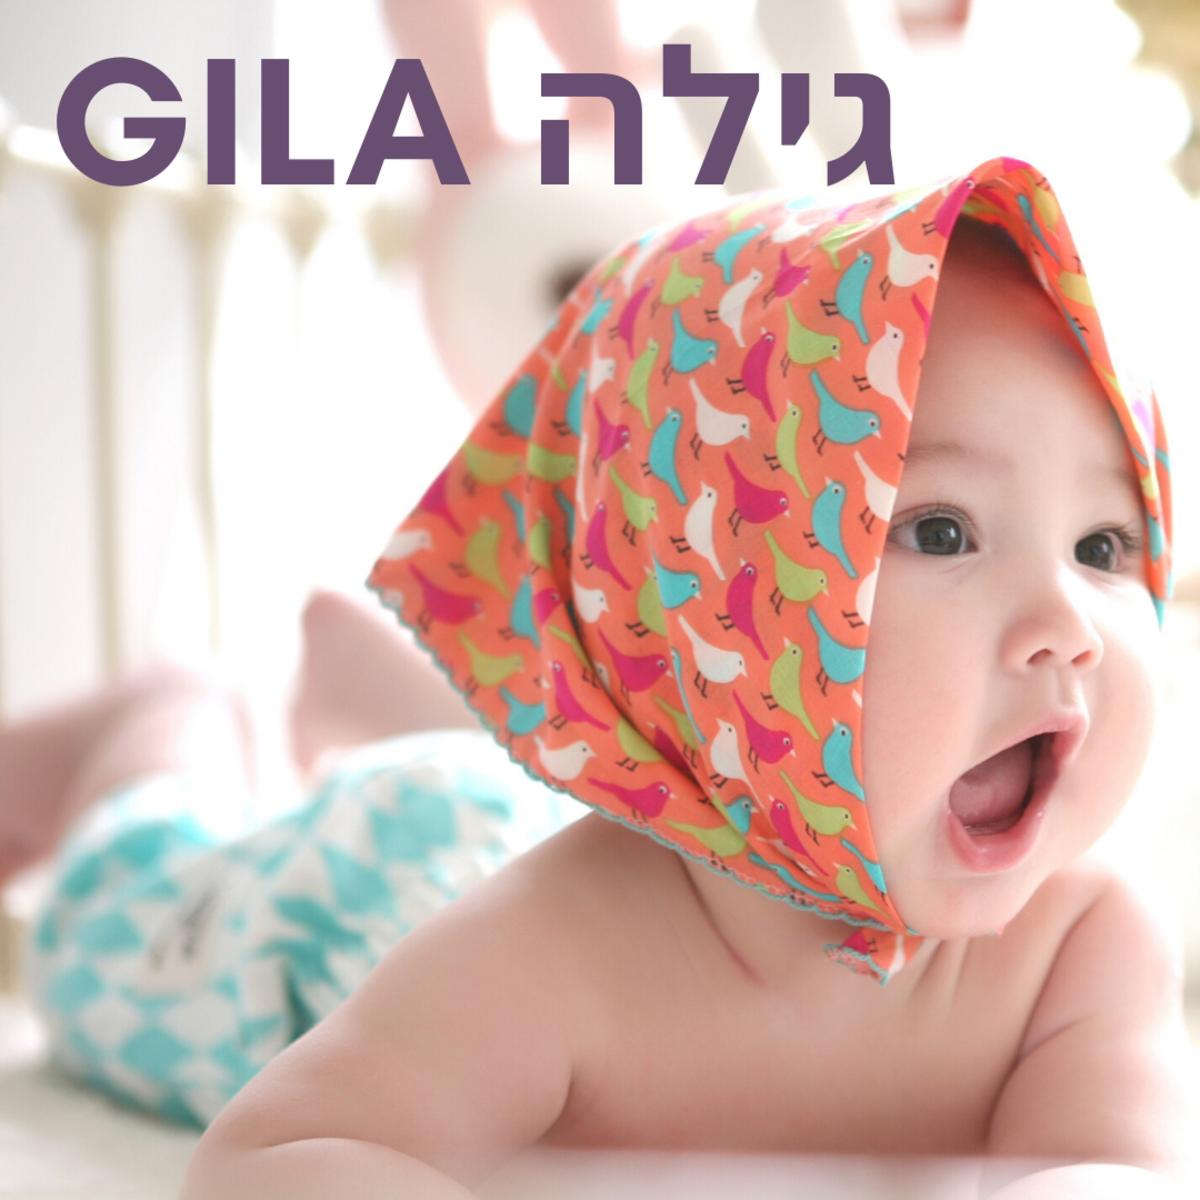 Baby Gila